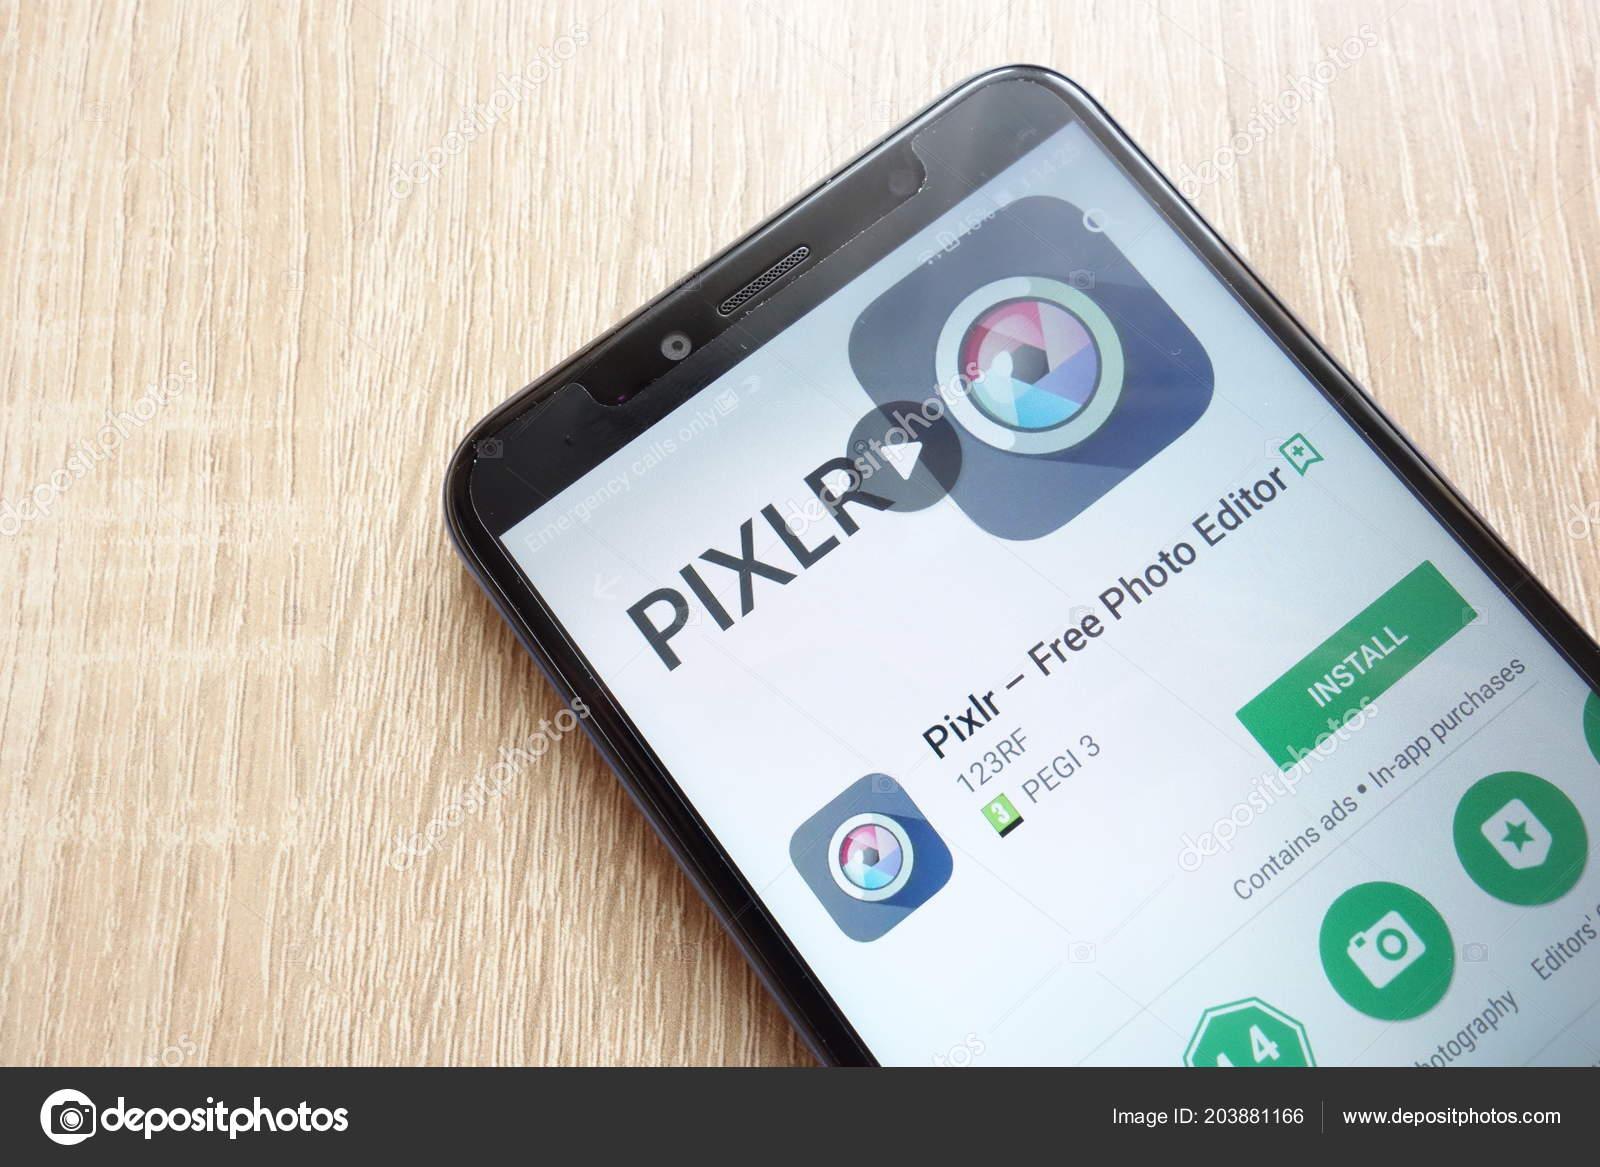 new photo editor app download 2018